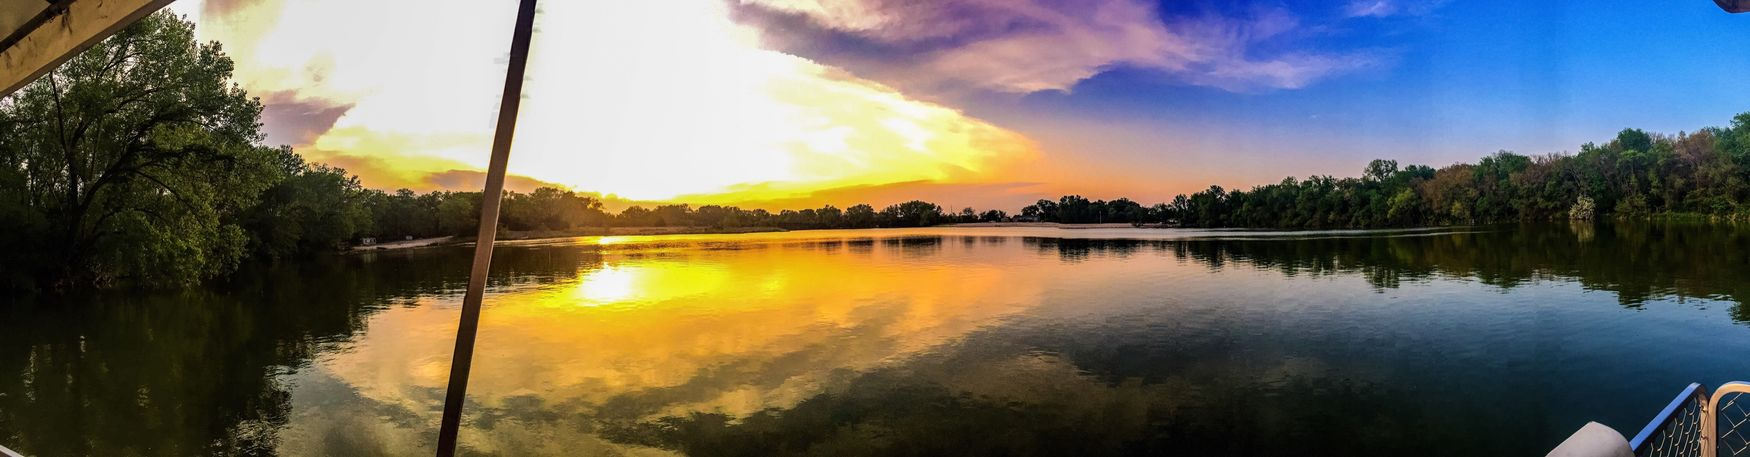 Lake Life Lake View Nebraska Skies Nebraska Sunsets  Nebraska Beautiful Photography Nature Nature Photography Enjoying Life